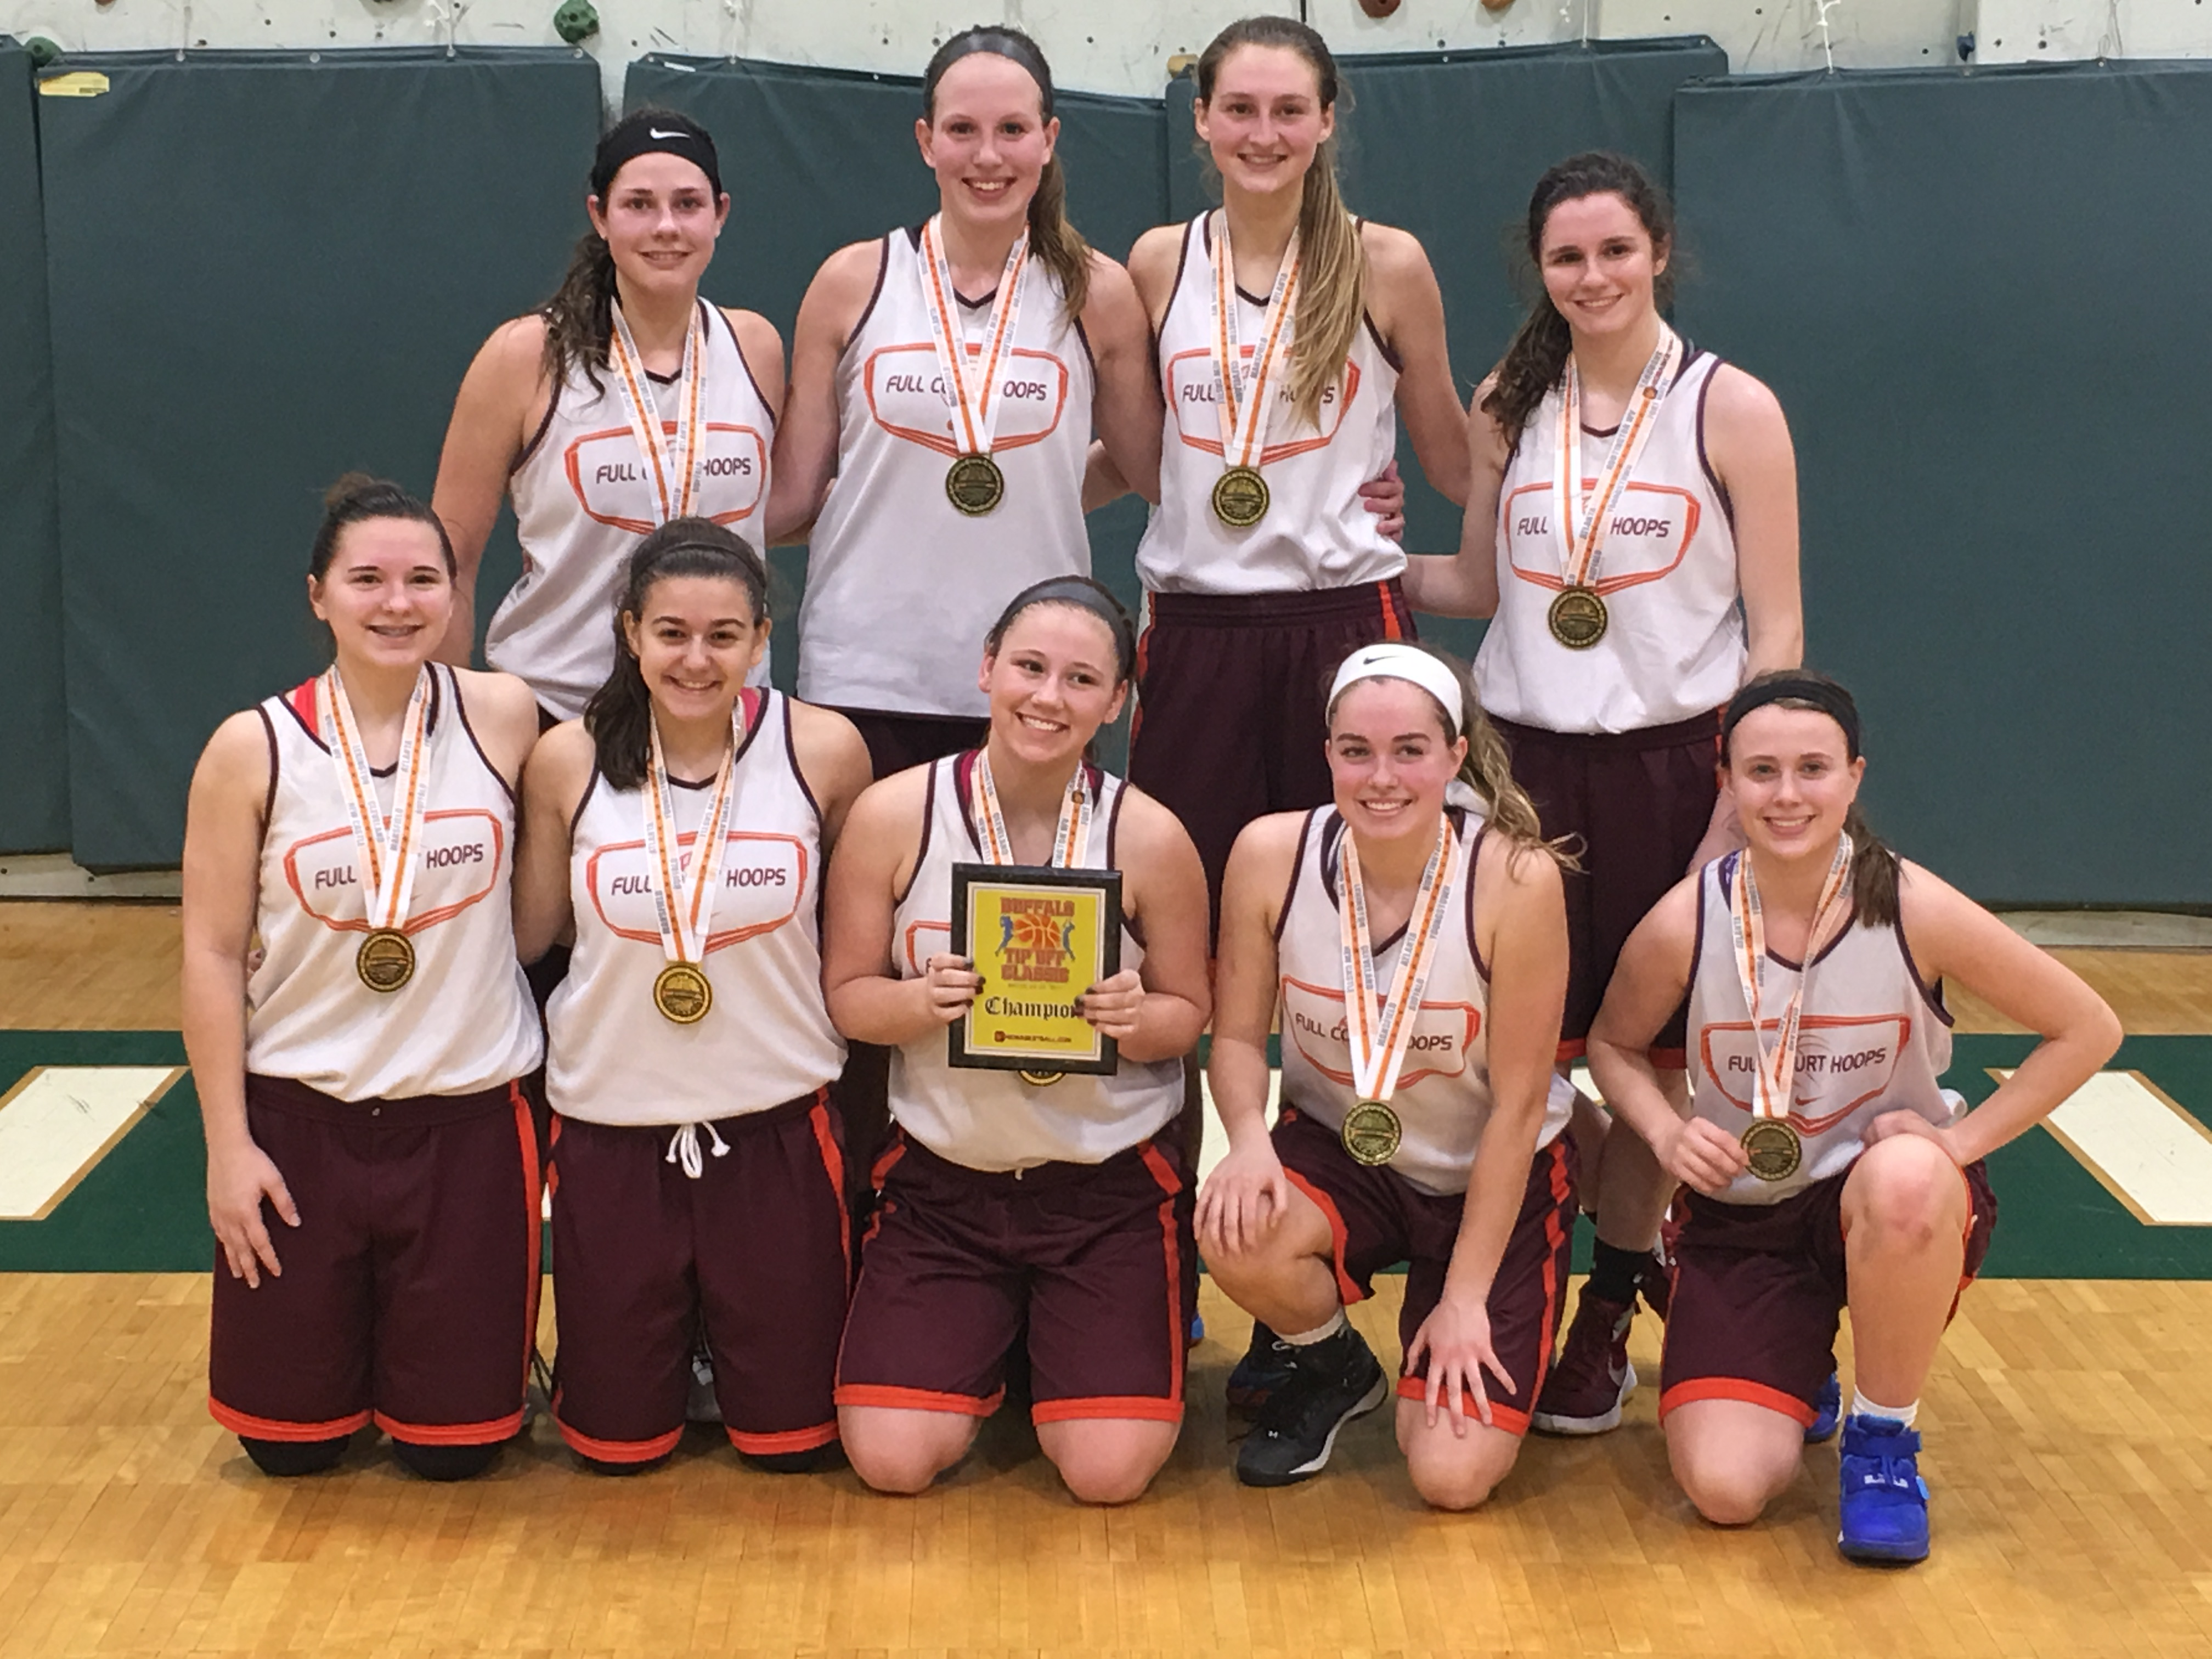 11th Grade Girls Champion- Full Court Hoops